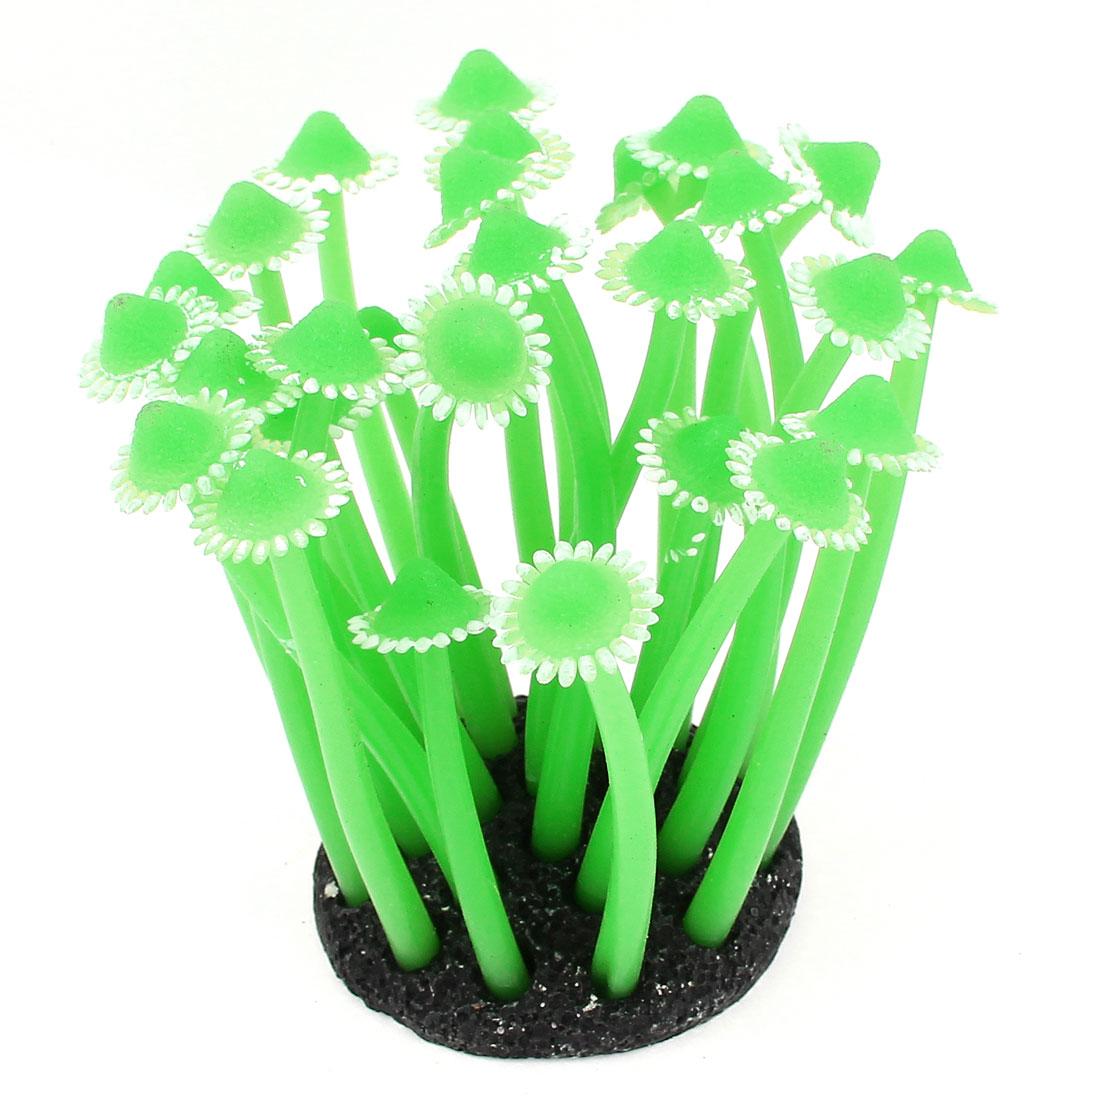 "3.5"" High Soft Silicone Aquarium Fish Tank Underwater Coral Decoration Green"